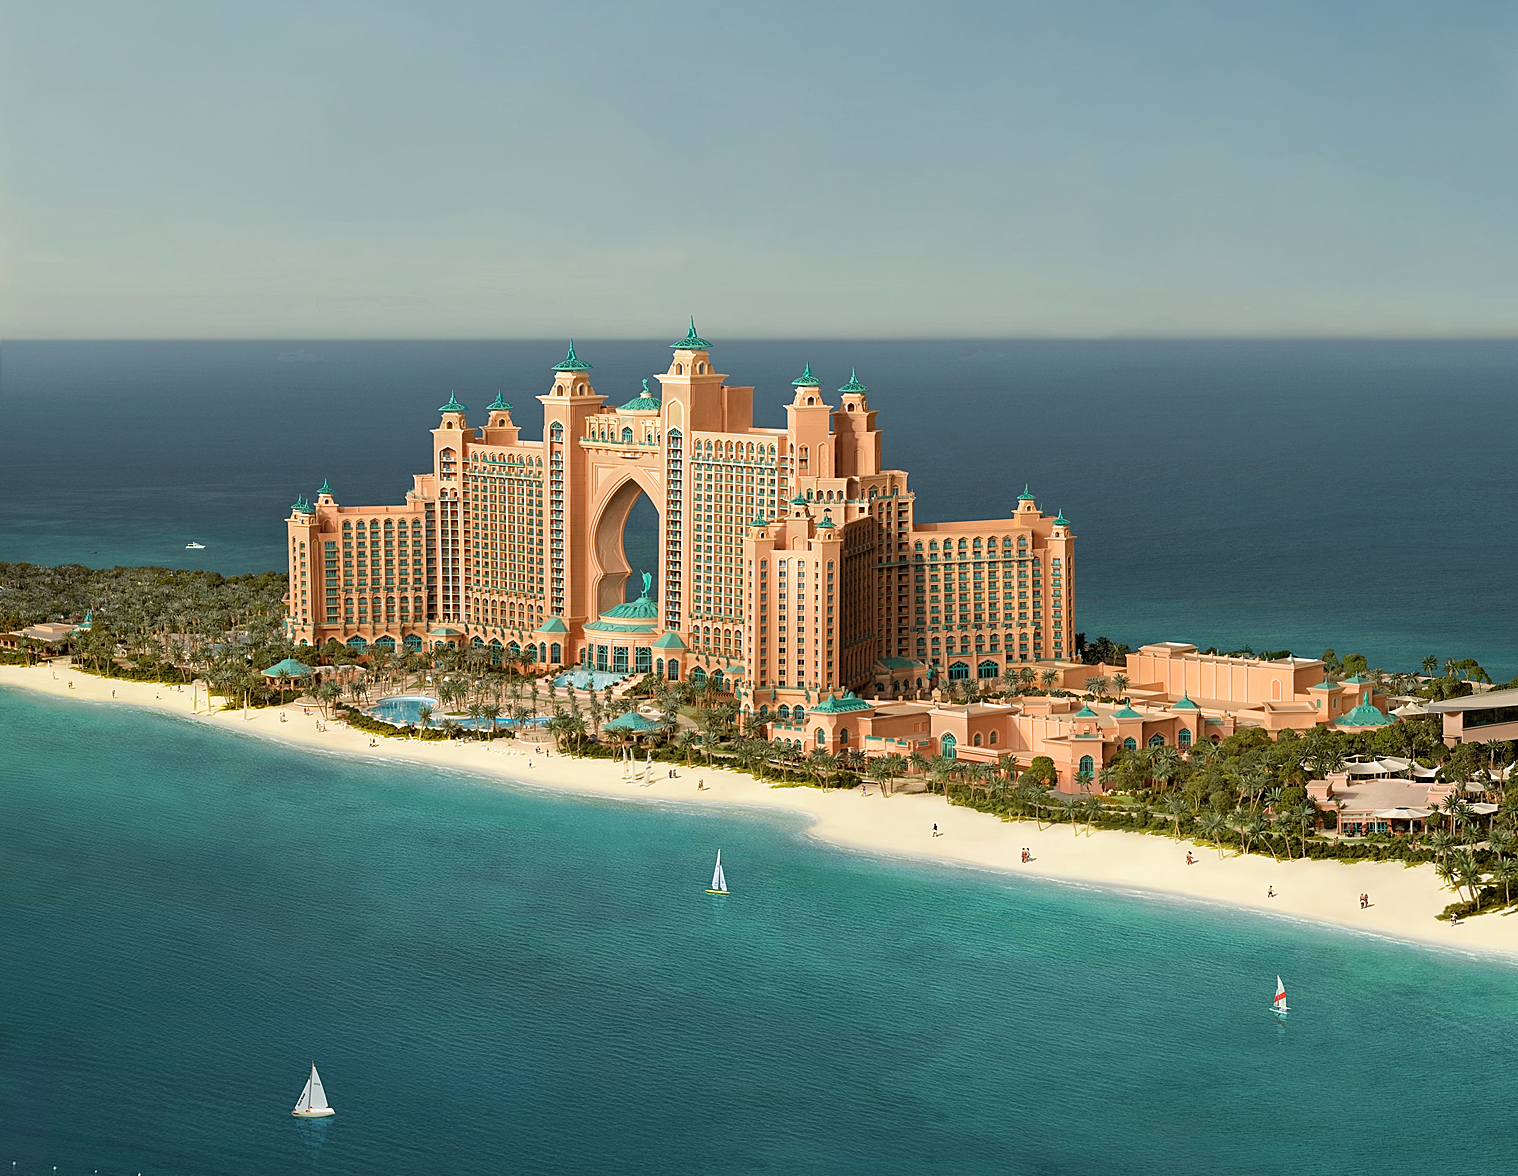 Social tv channel launch at atlantis hotel in dubai tint for Dubai luxury places